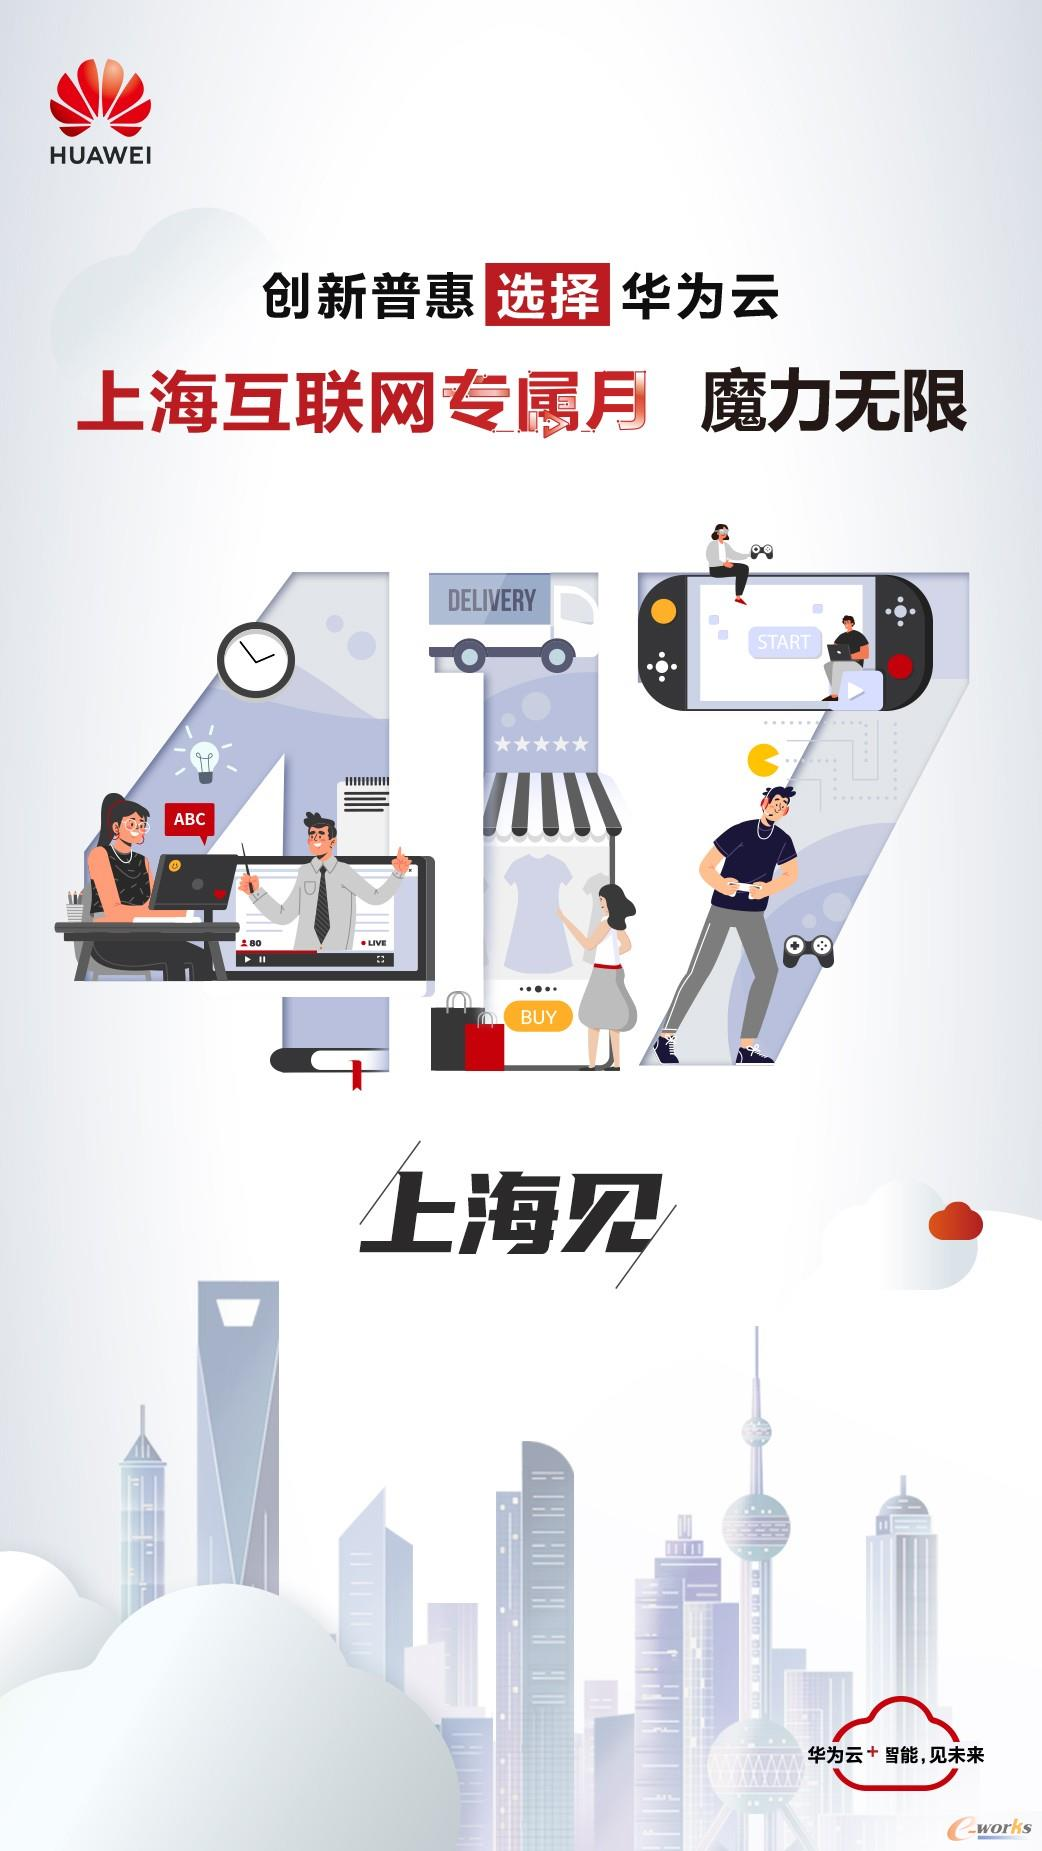 http://www.e-works.net.cn/News/articleimage/20214/132629263058425048_new.jpg